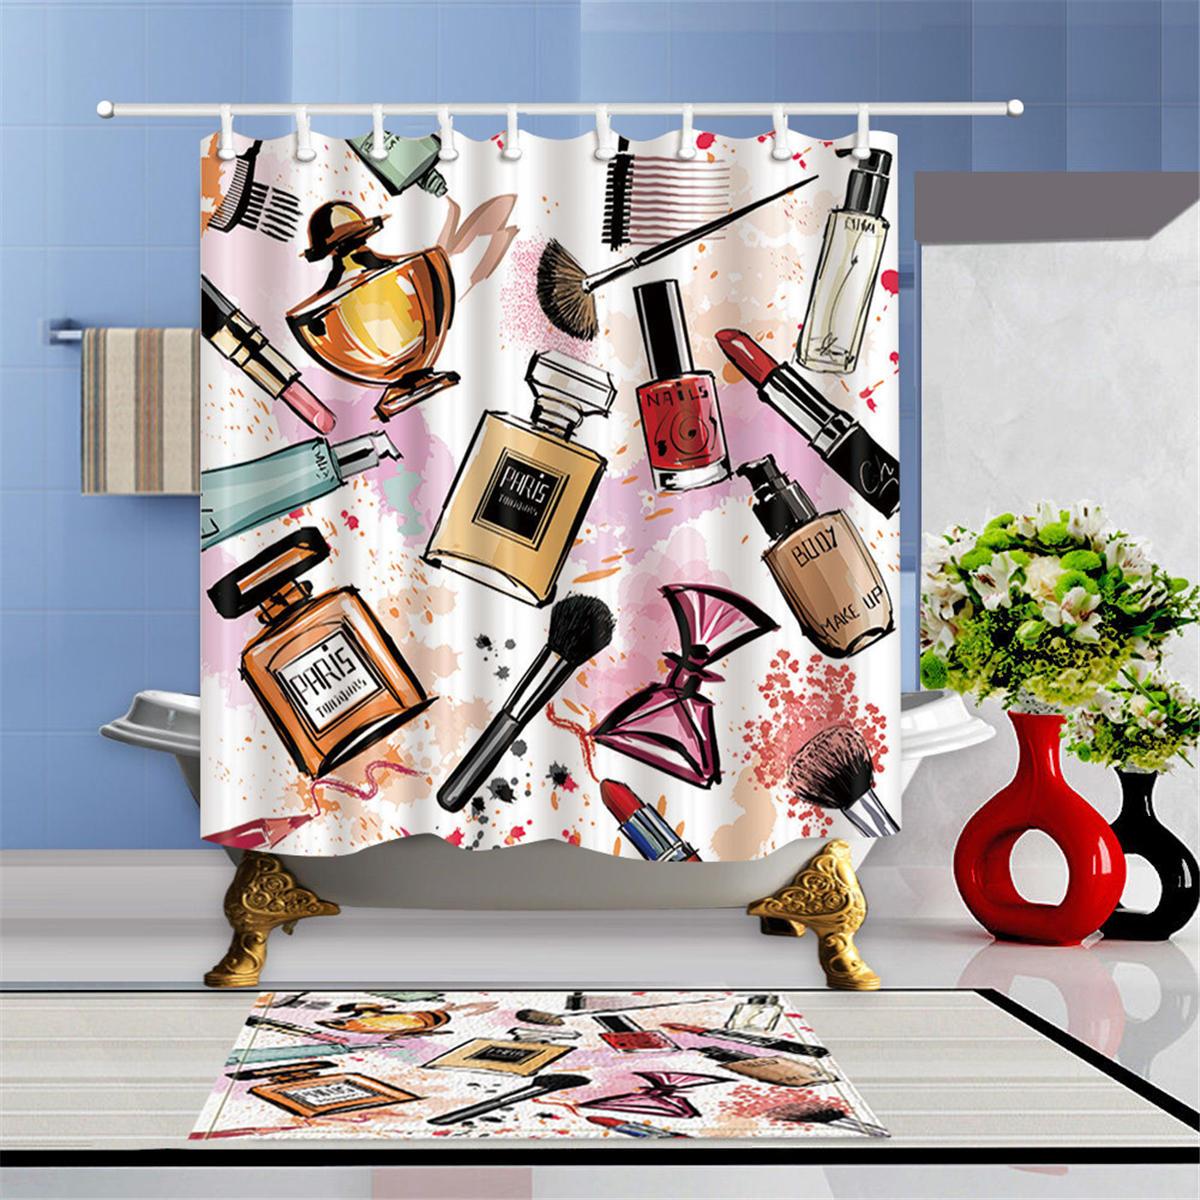 Fashion Cosmetic Waterproof Bathroom Shower Curtain Set With Hooks & Bath Mat Floor Mat, Banggood  - buy with discount